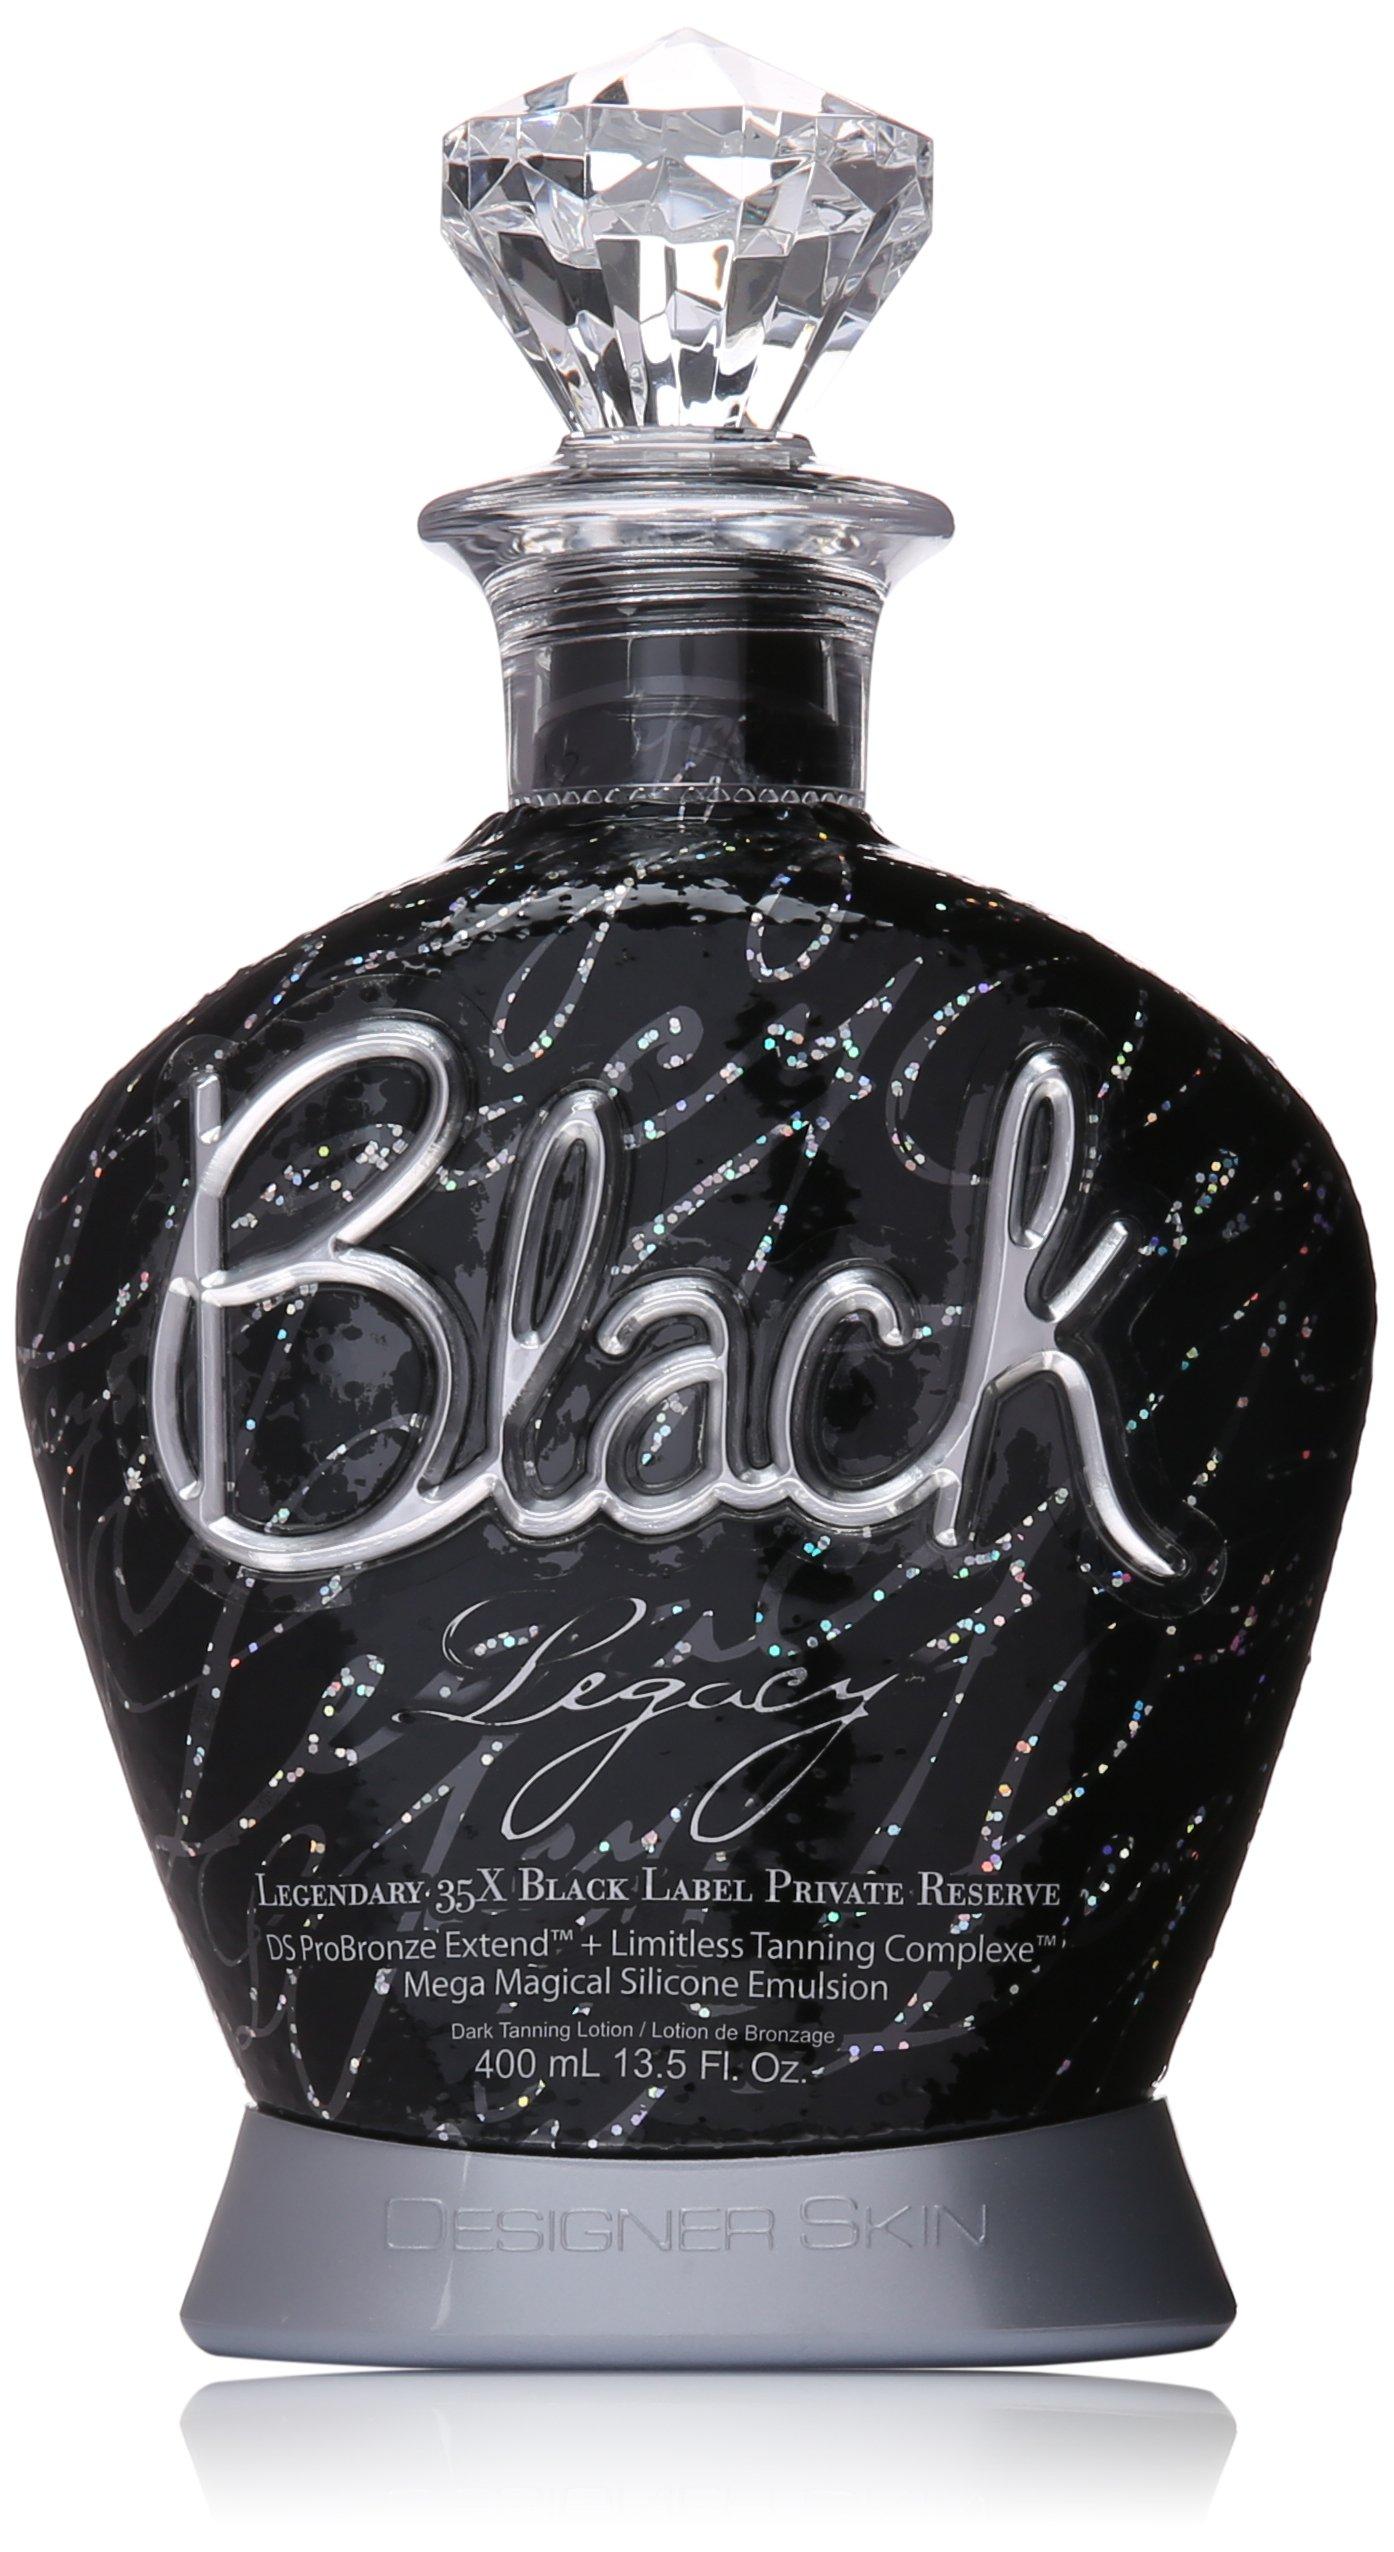 New Sunshine Designer Skin Bronzer, Black Legacy, 13.5 Ounce by New Sunshine